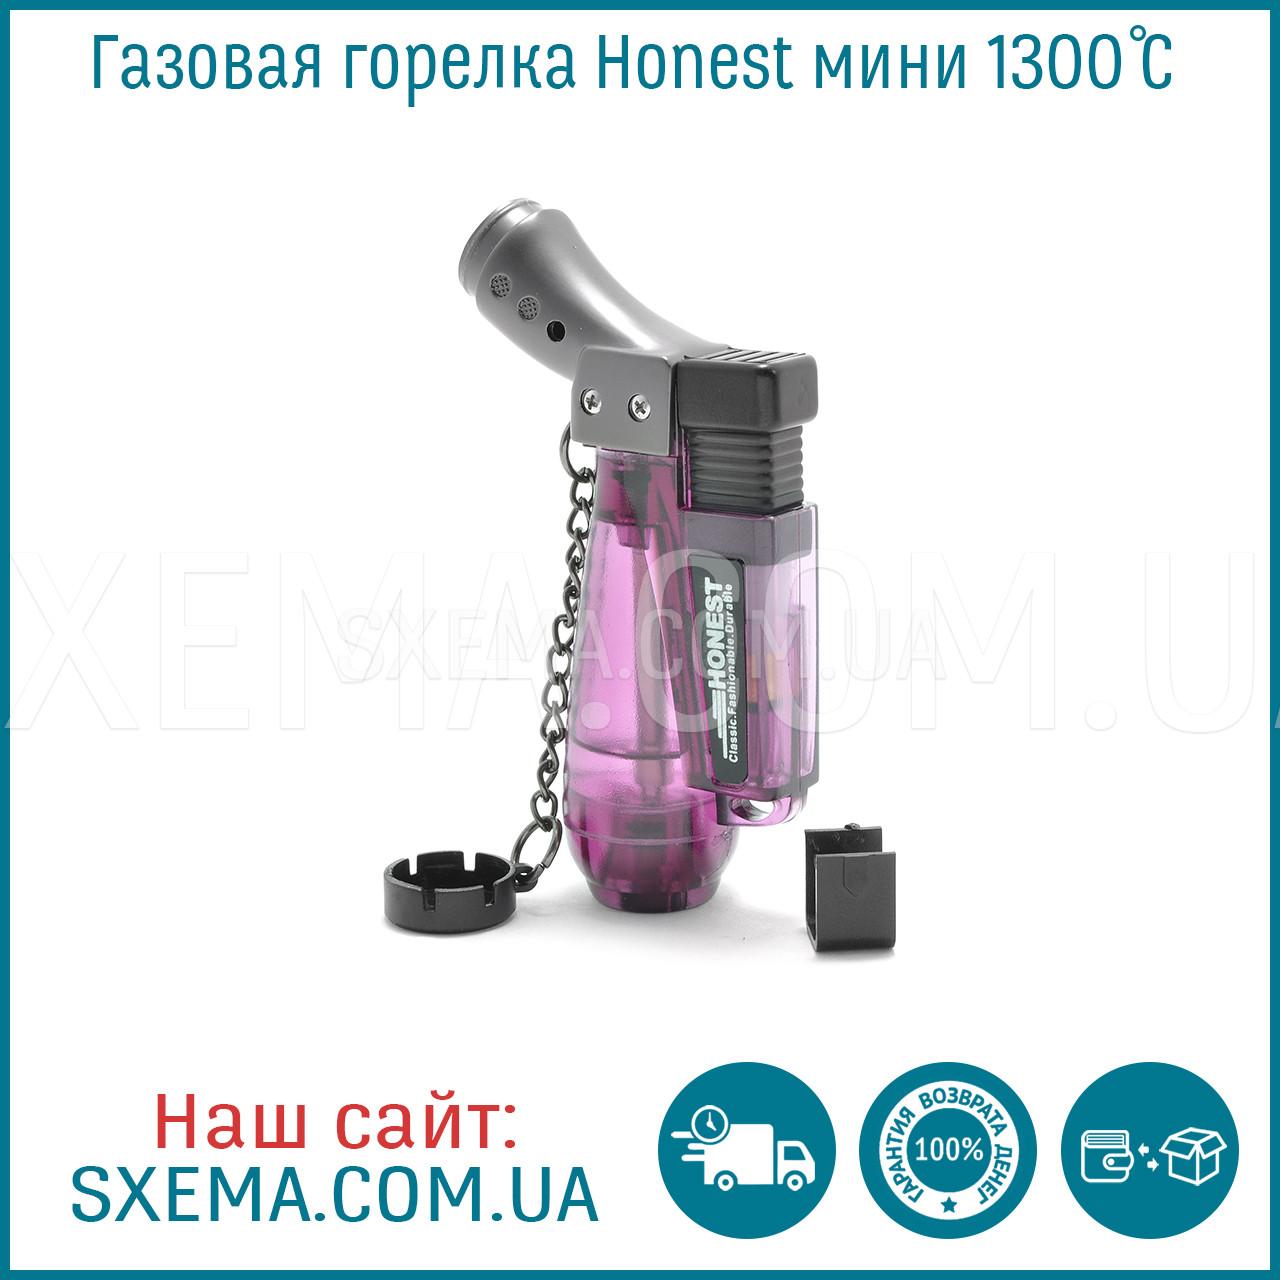 Газовая горелка Honest мини 1300c